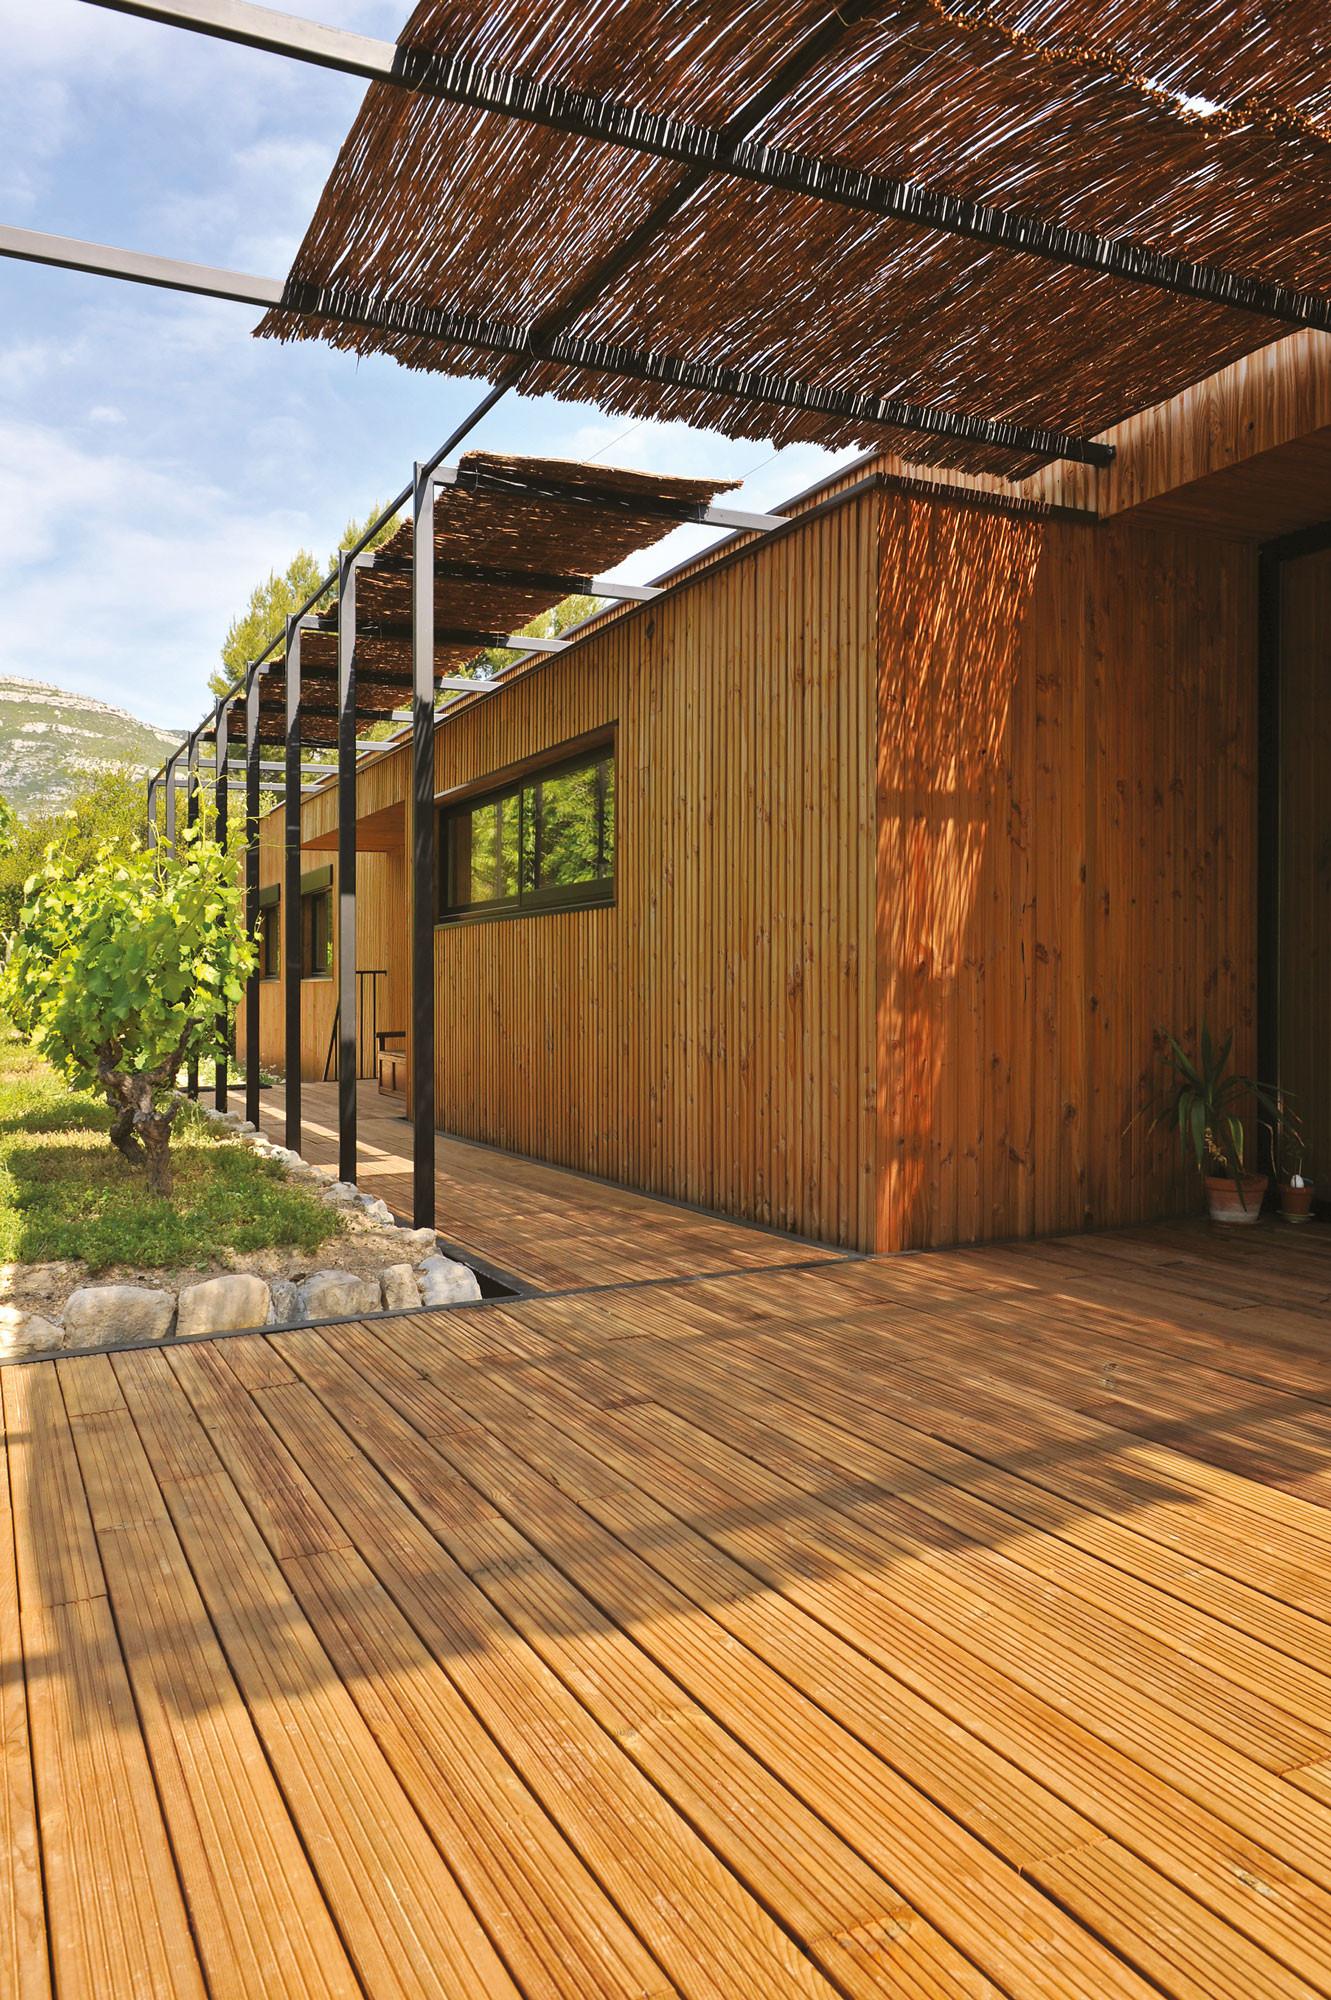 lame de terrasse cancun pin cl4 marron rainur e 28x145mm pin trait classe 4 terrasse en. Black Bedroom Furniture Sets. Home Design Ideas